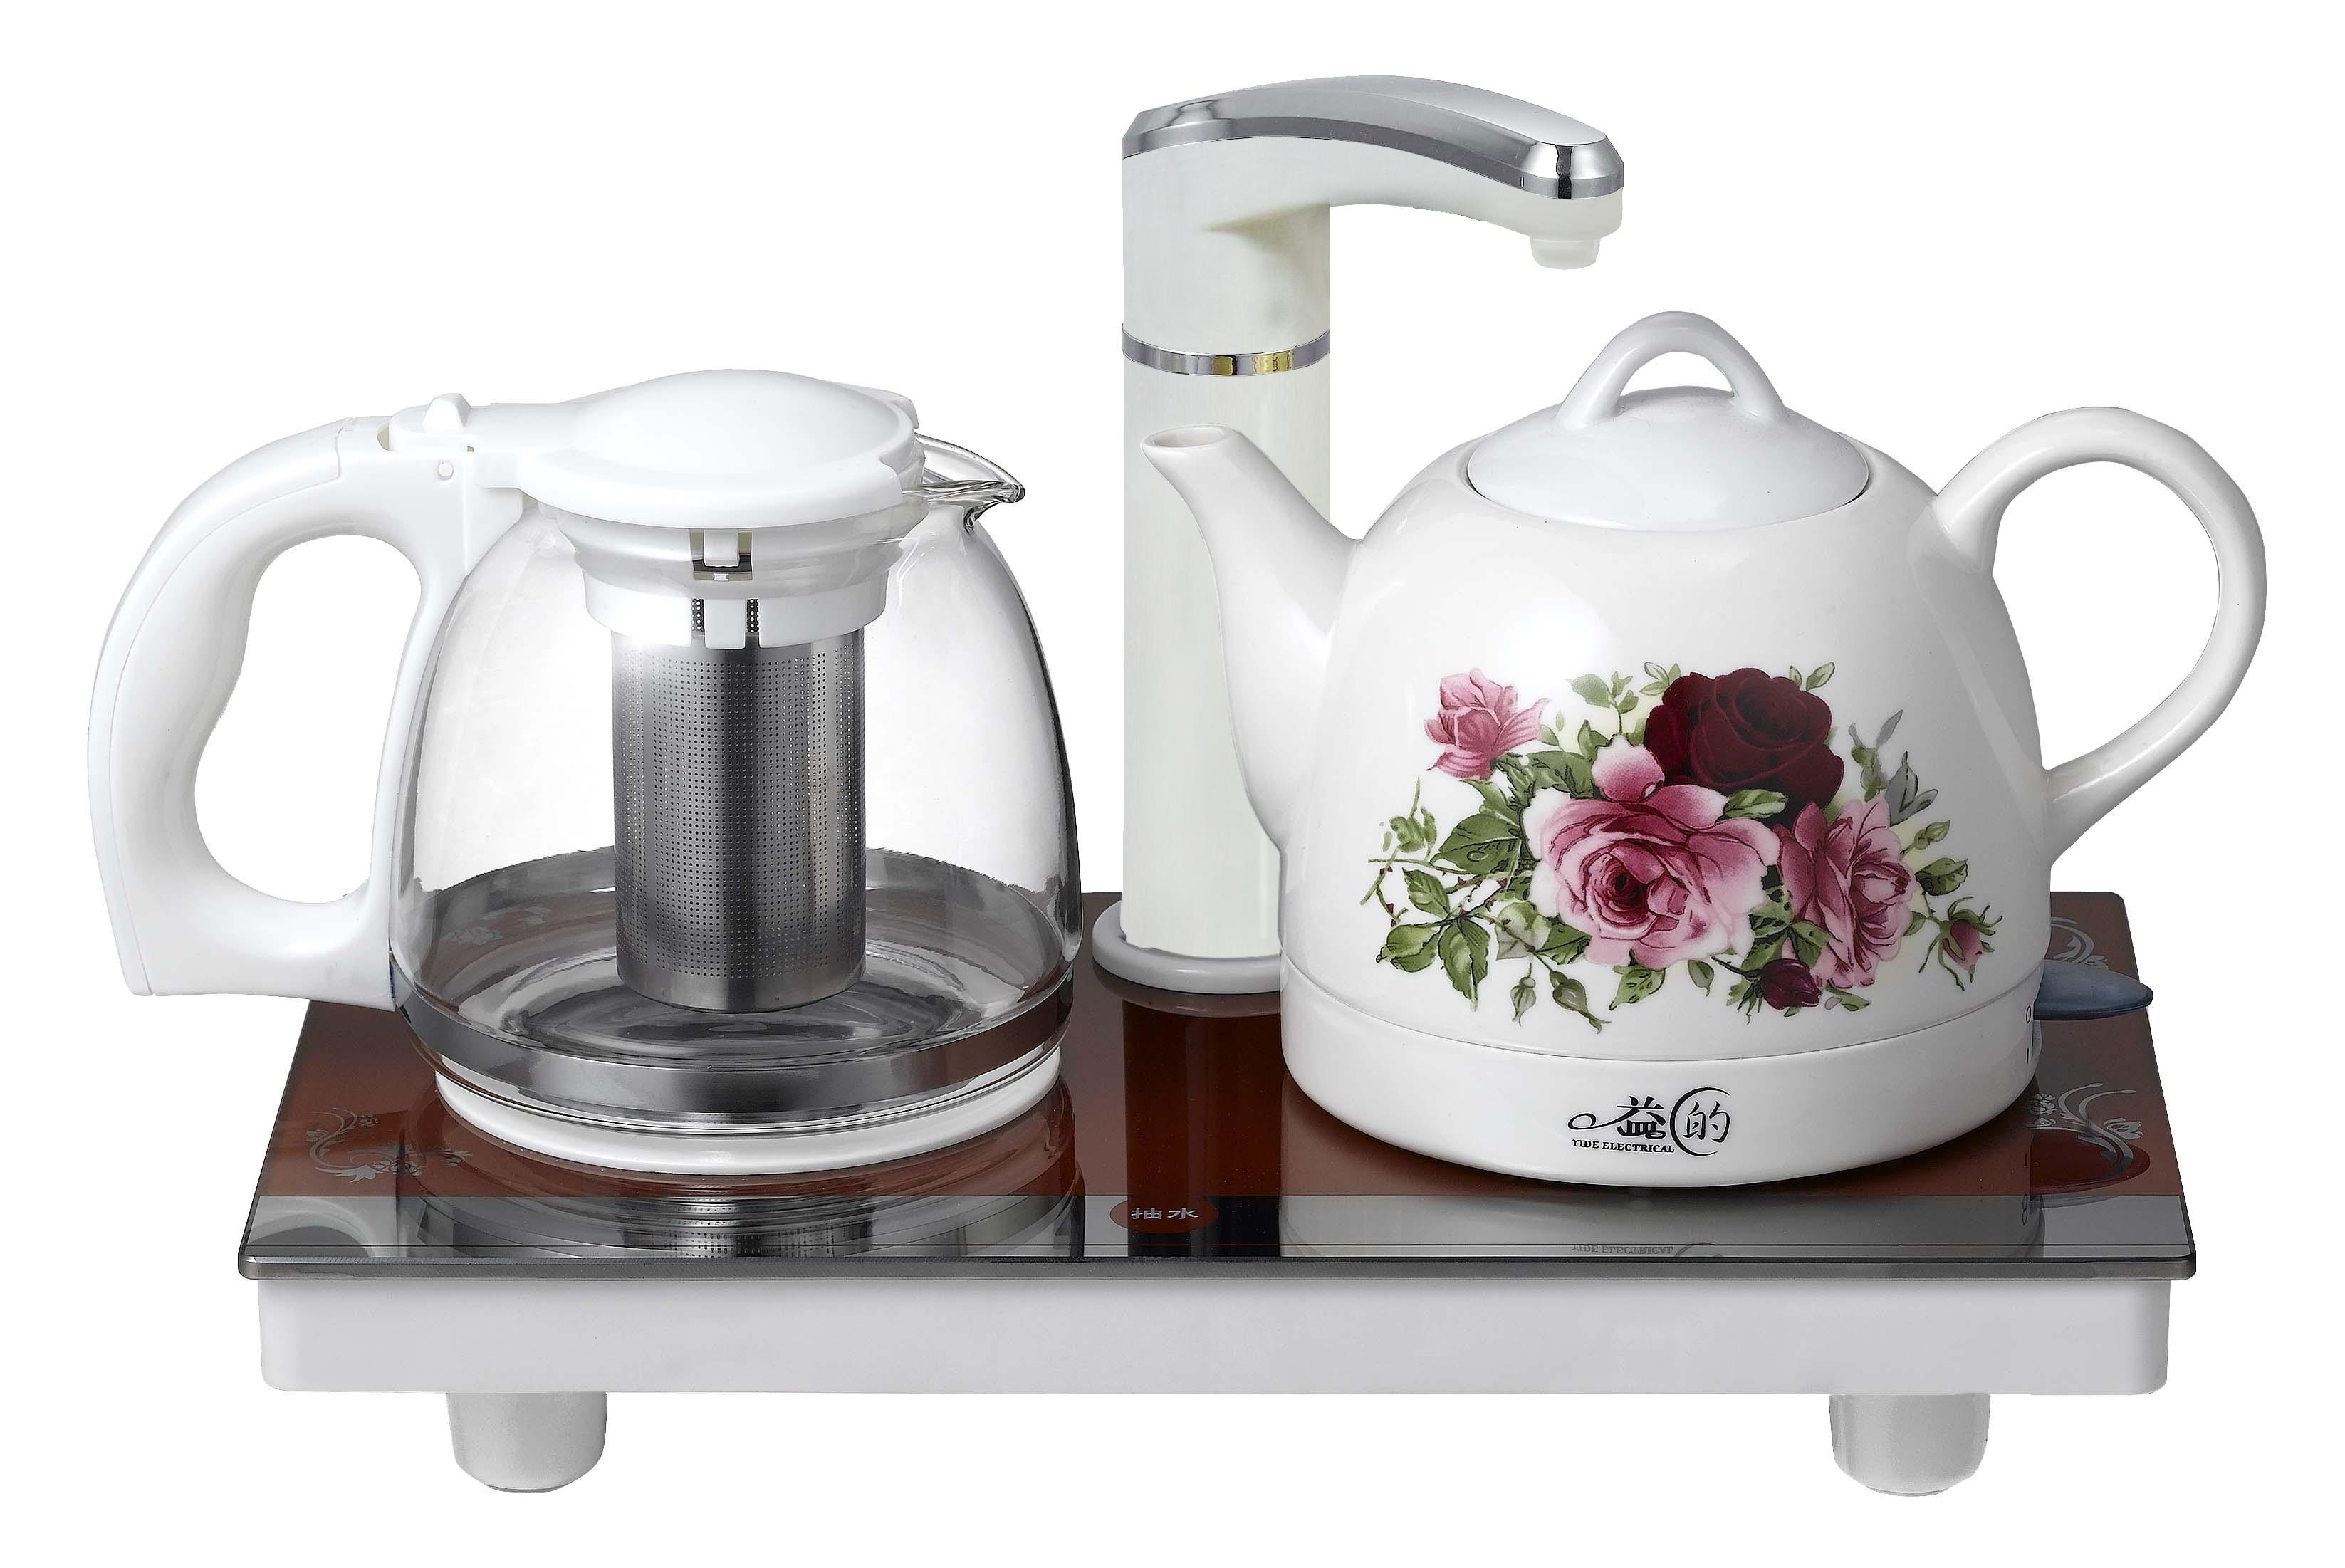 Yd-cs107 water pumping set automatic electric heating kettle ceramic set water pumping ceramic tea set(China (Mainland))